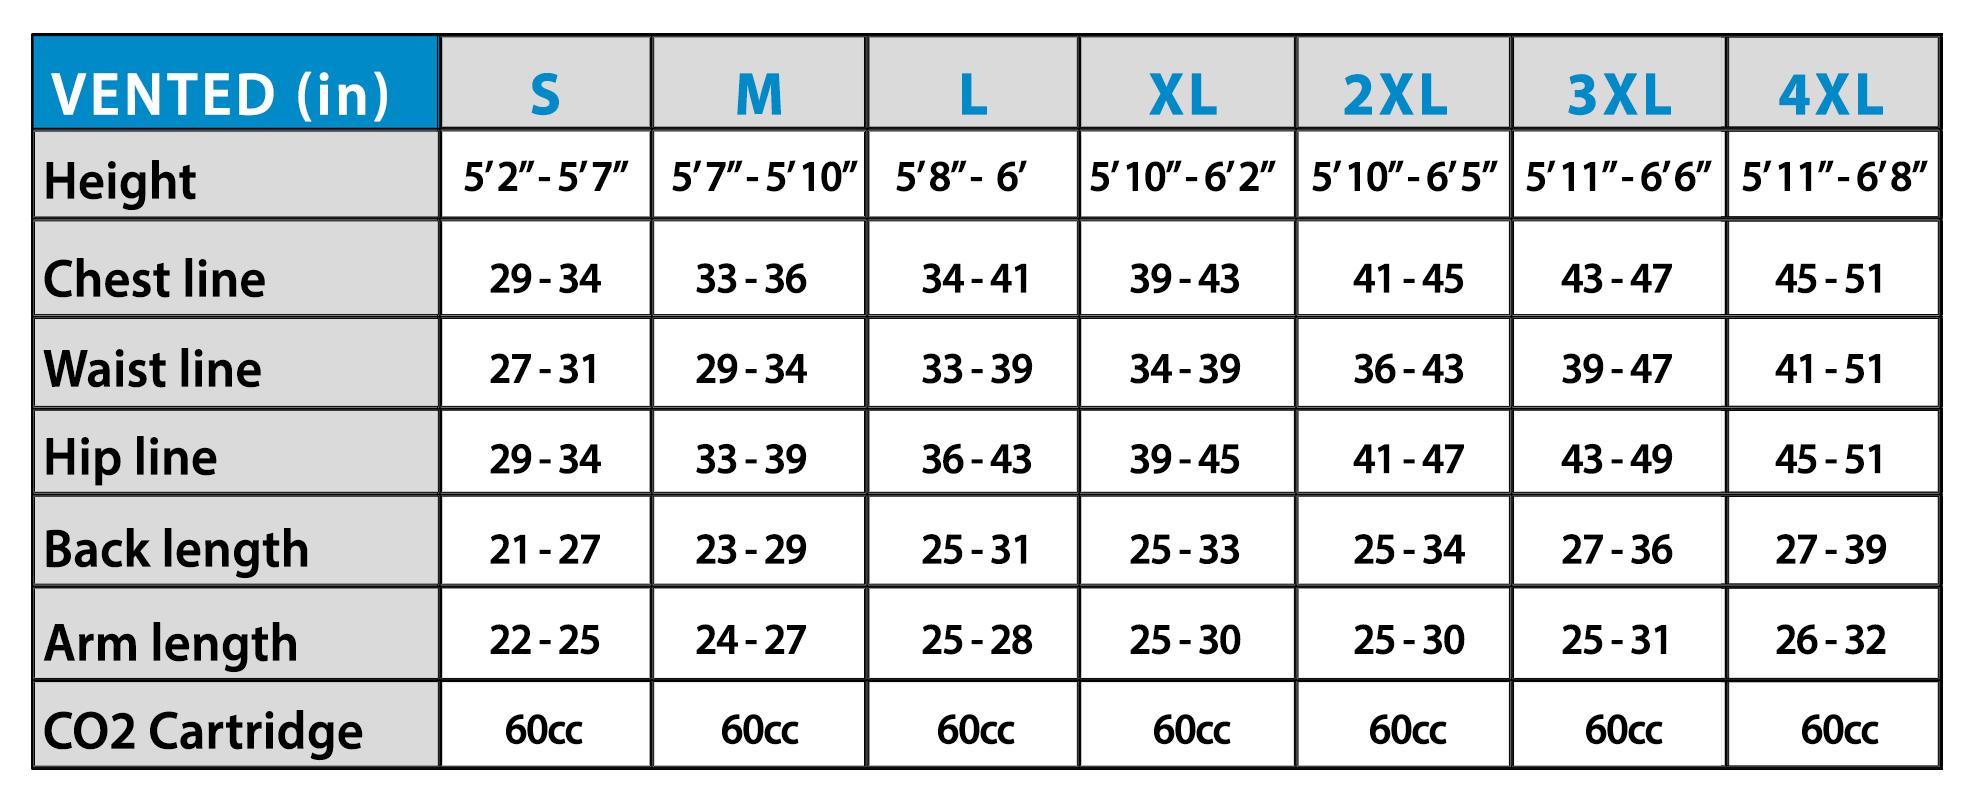 helite-sizing-chart-vented-2.jpg